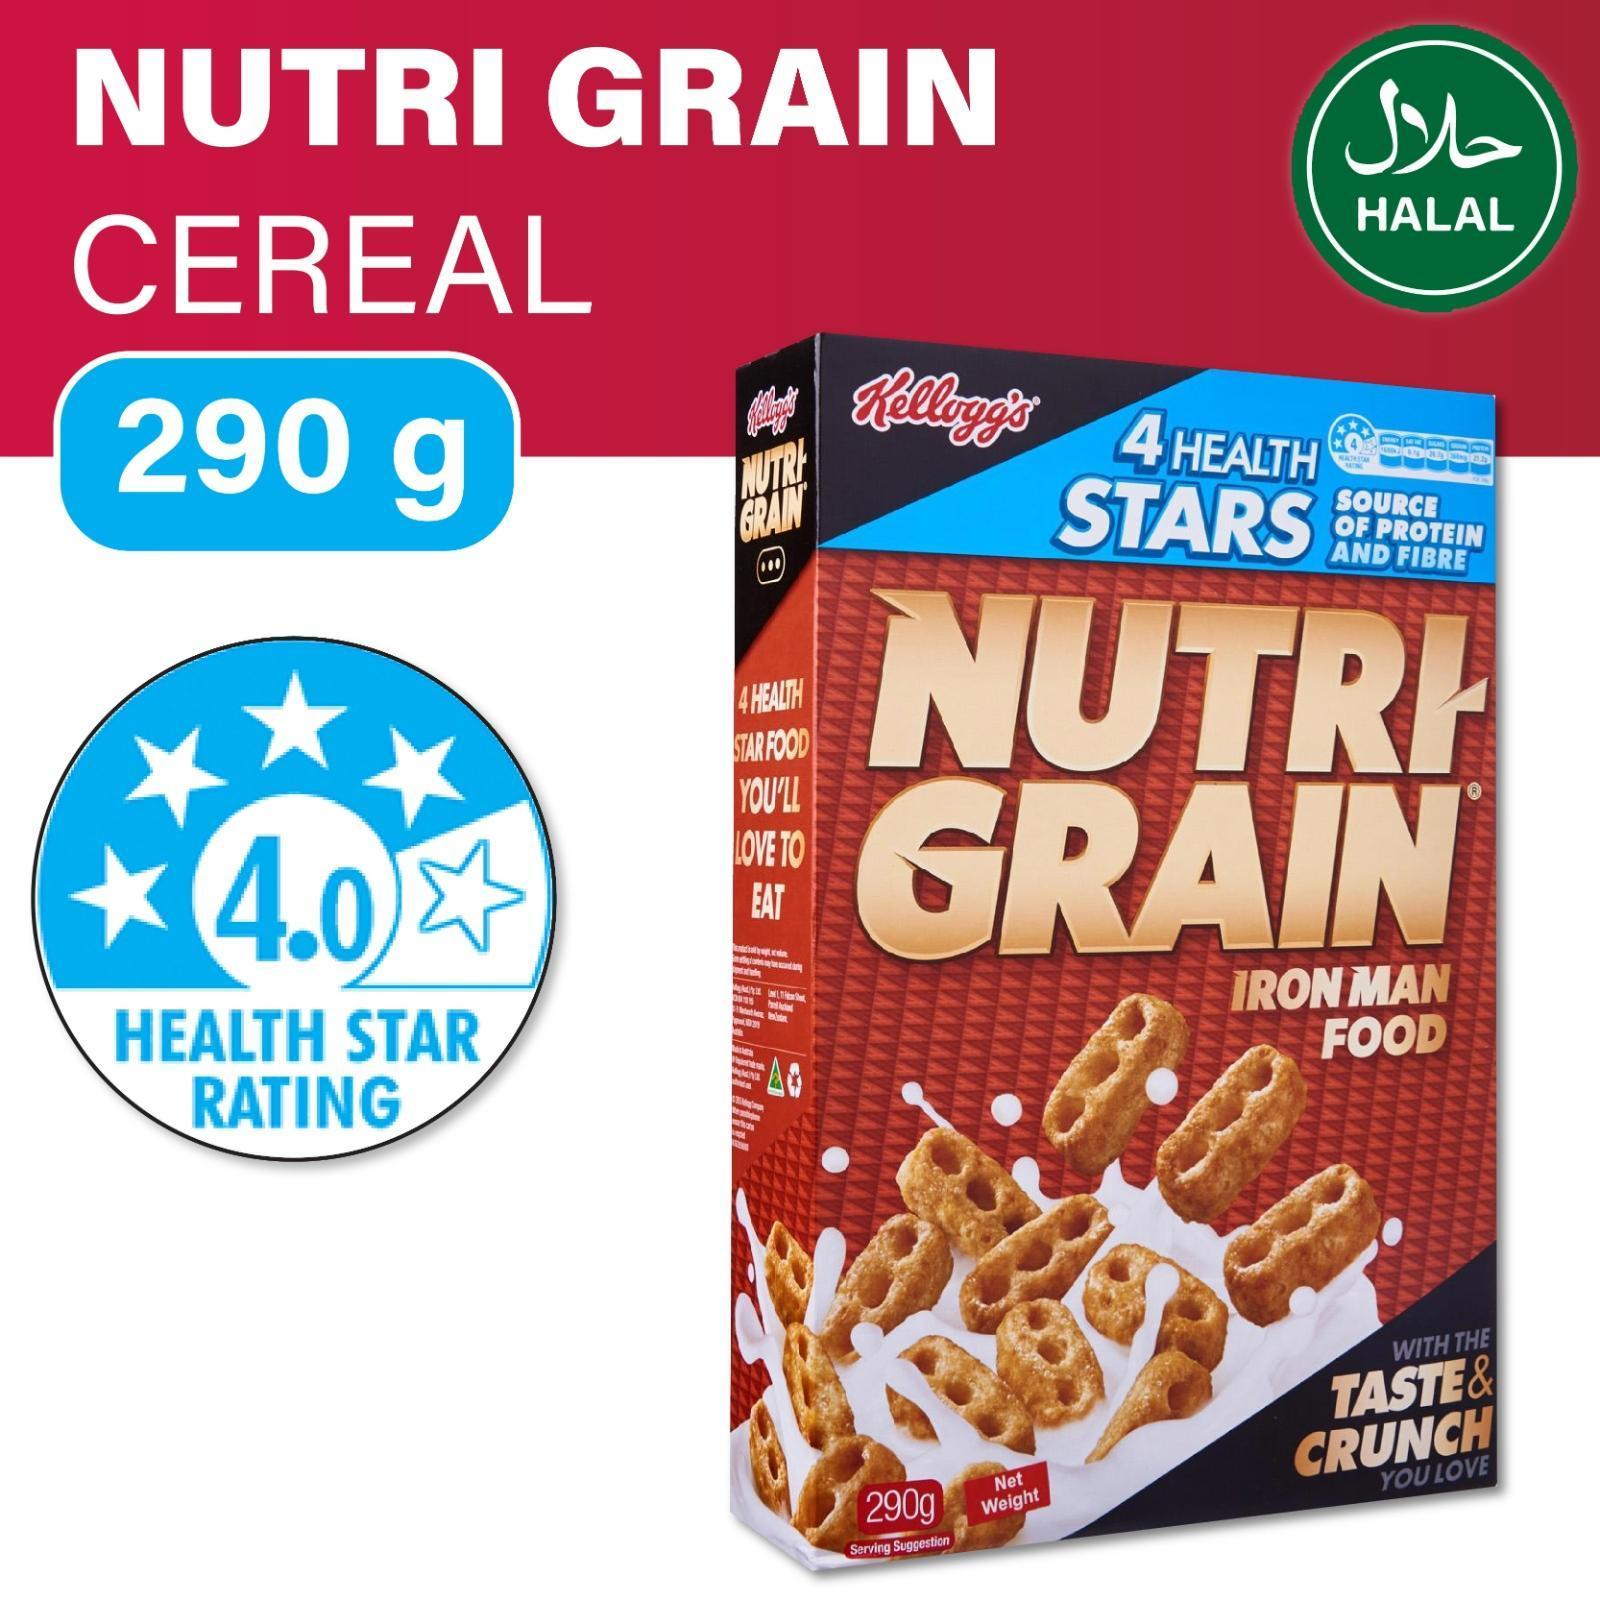 Kellogg's Nutri Grain Iron Man Cereal